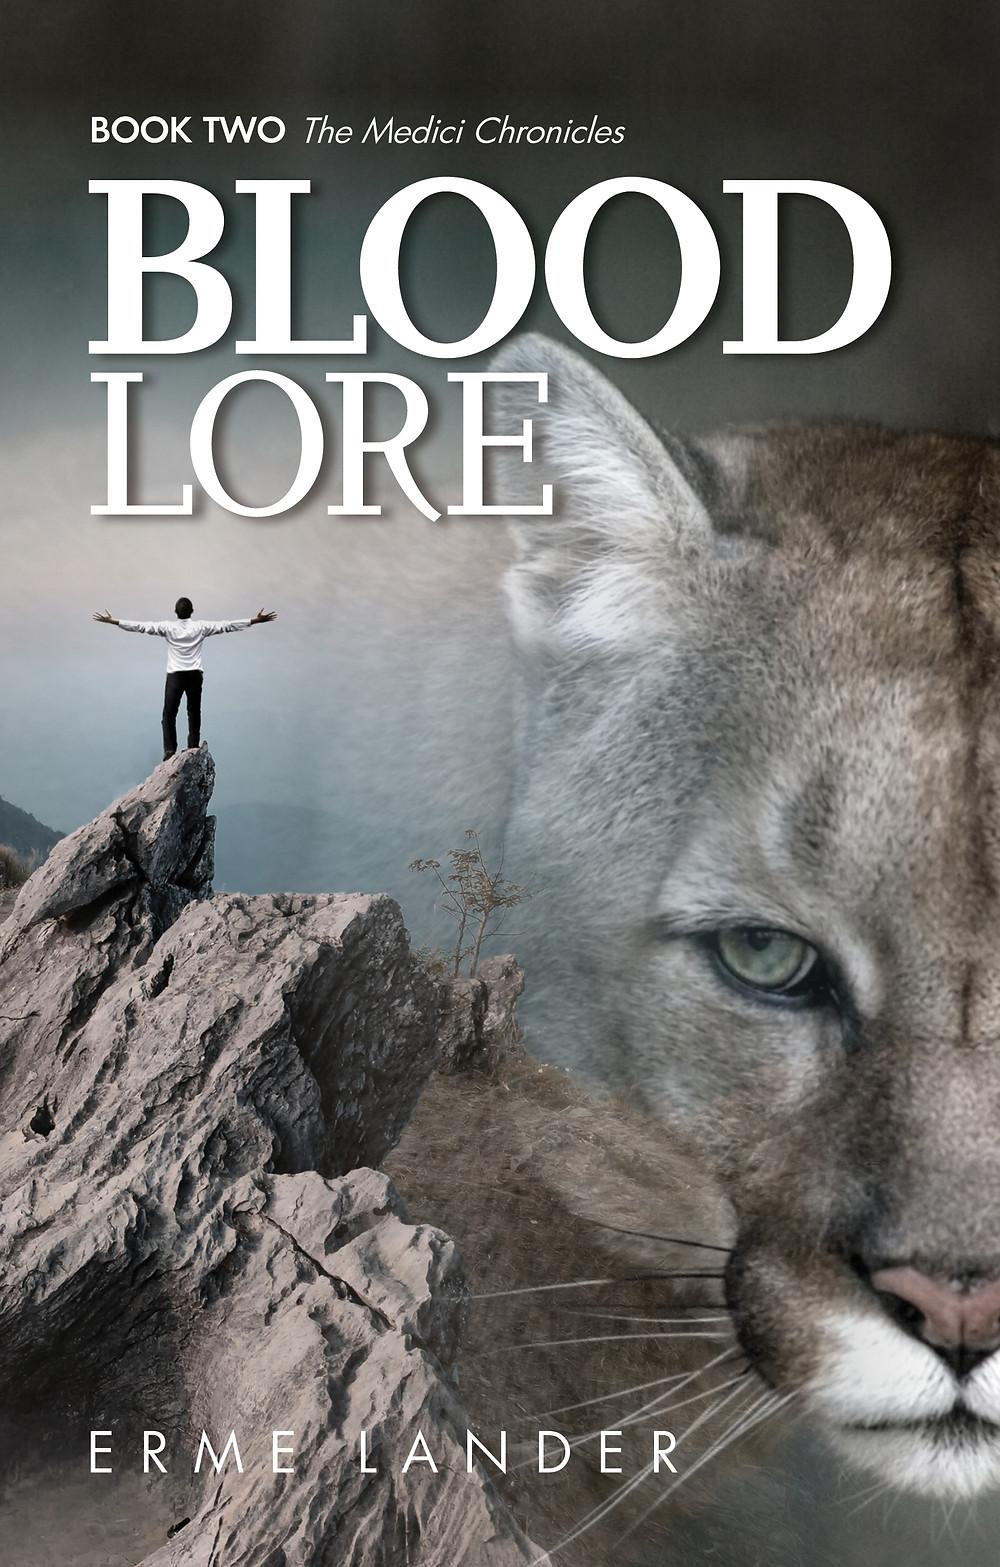 Blood Lore